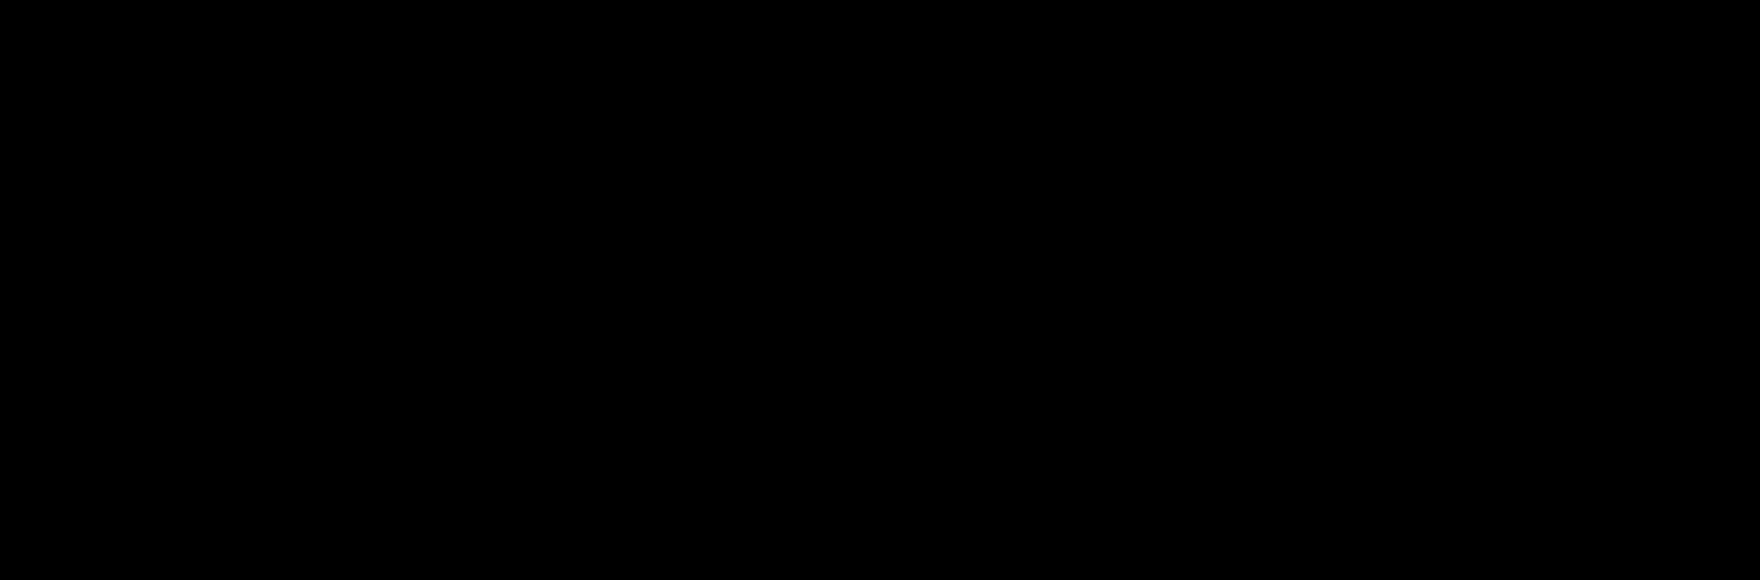 Albendazole-d<sub>3</sub> sulfoxide